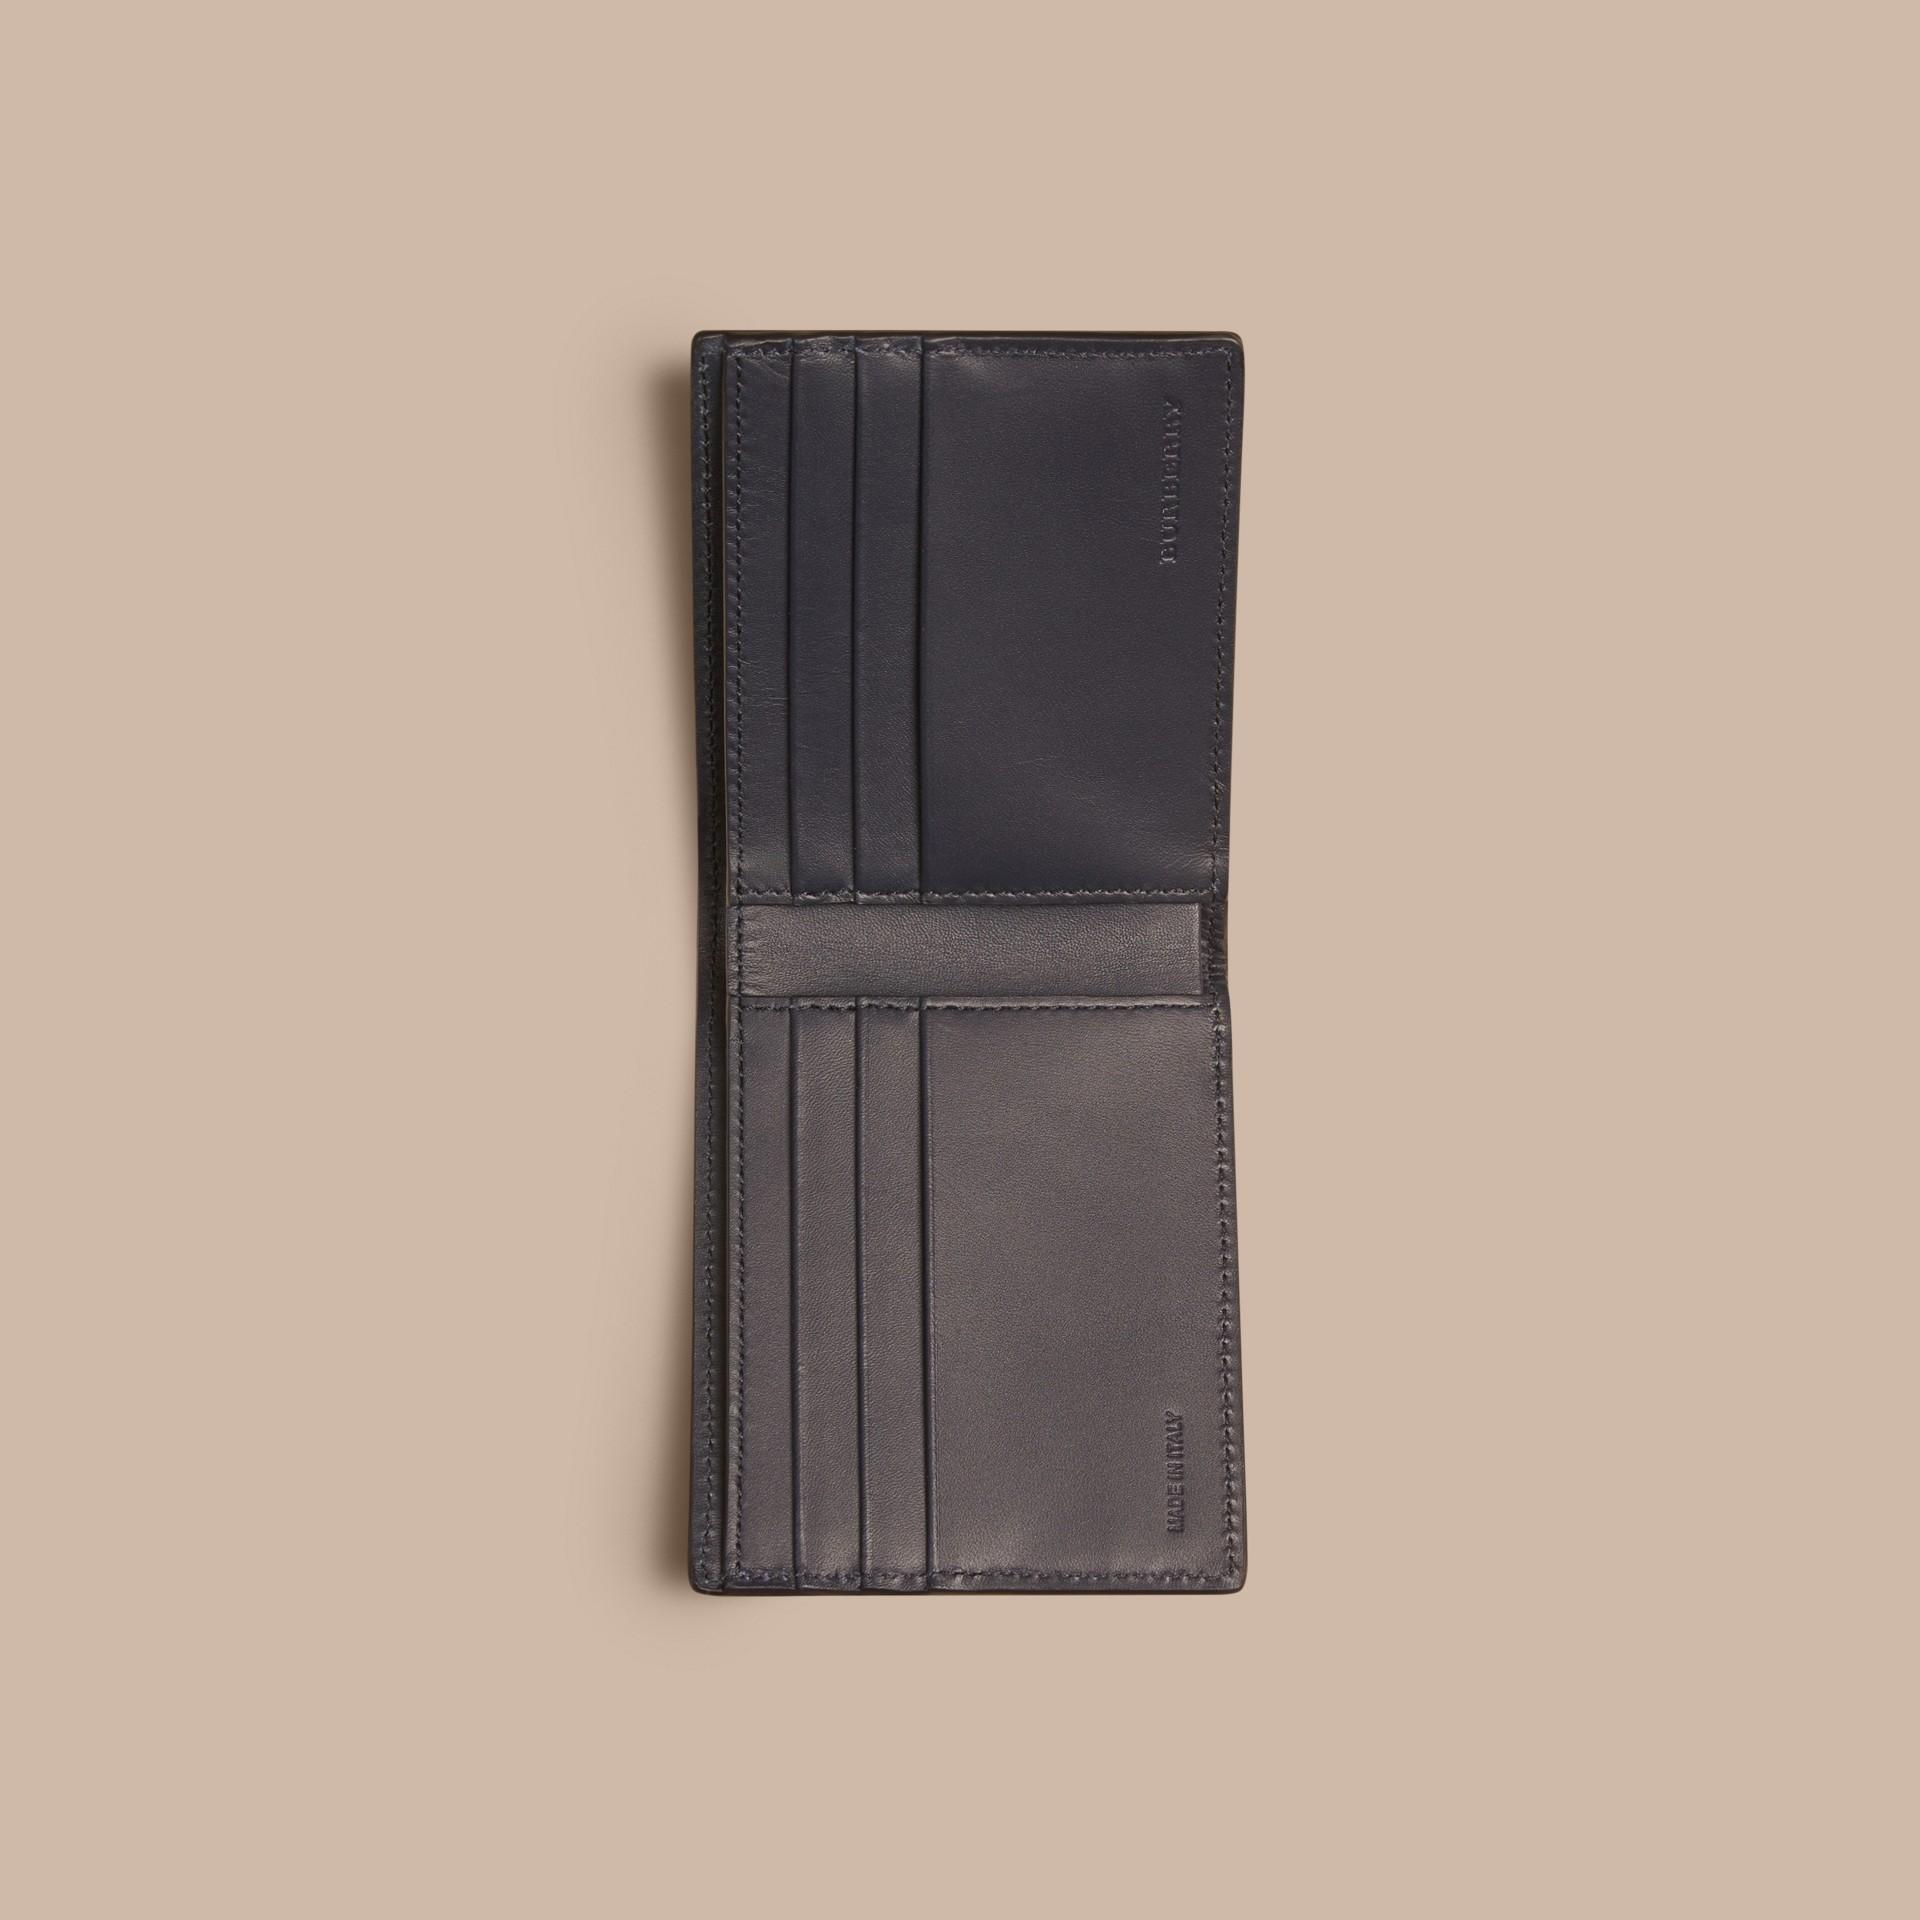 Dark navy London Leather Folding Wallet Dark Navy - gallery image 4